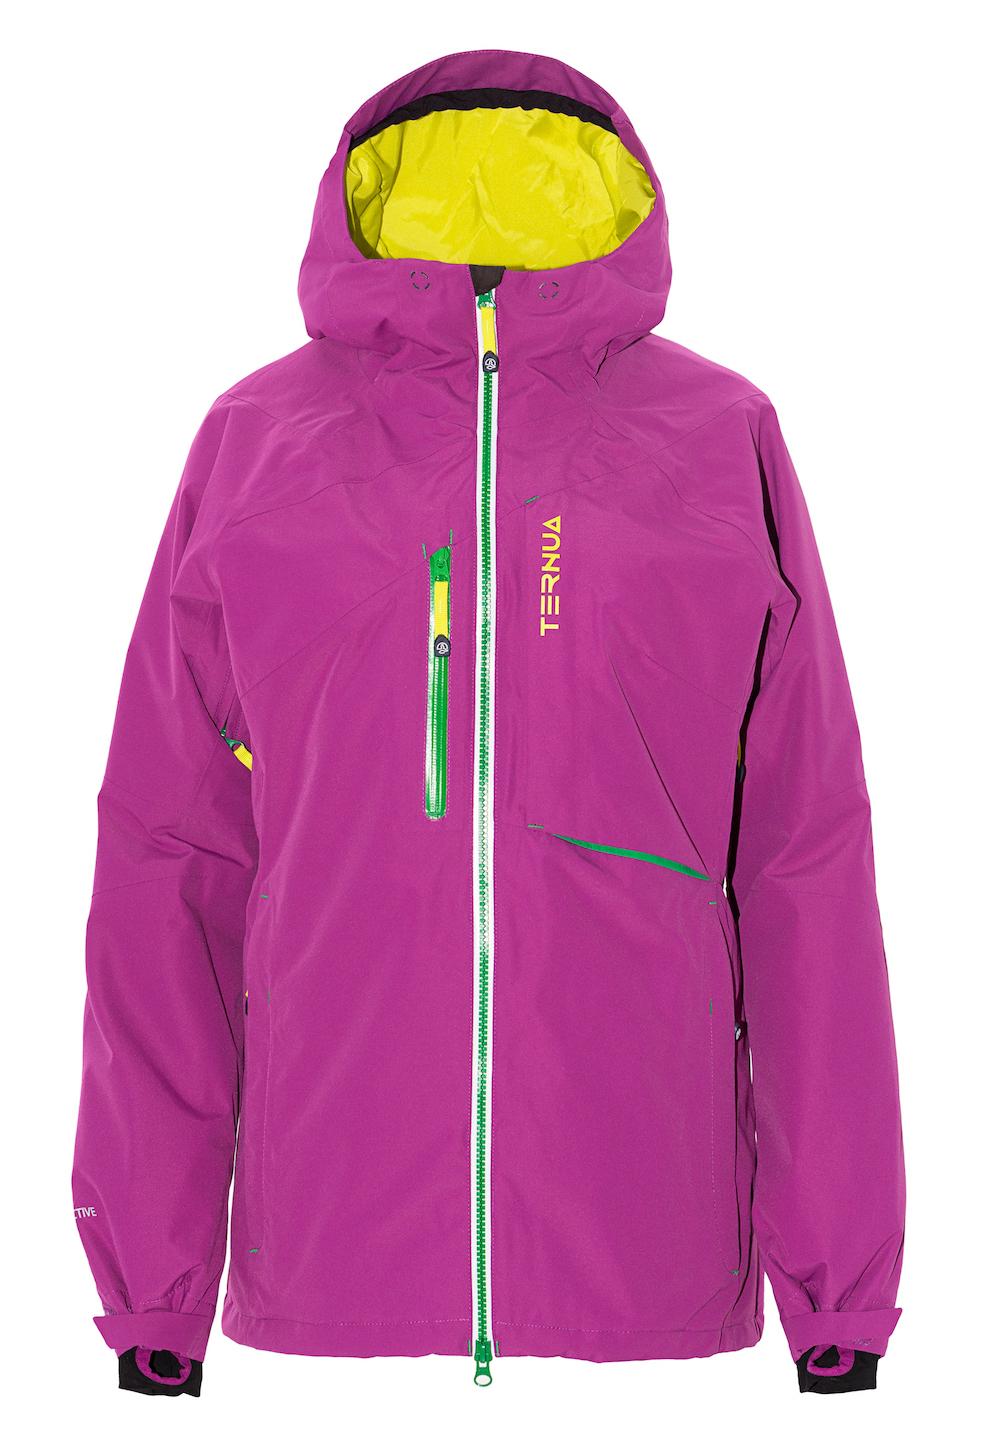 Ternua - Tepee Jacket - Hardshell jacket - Women's